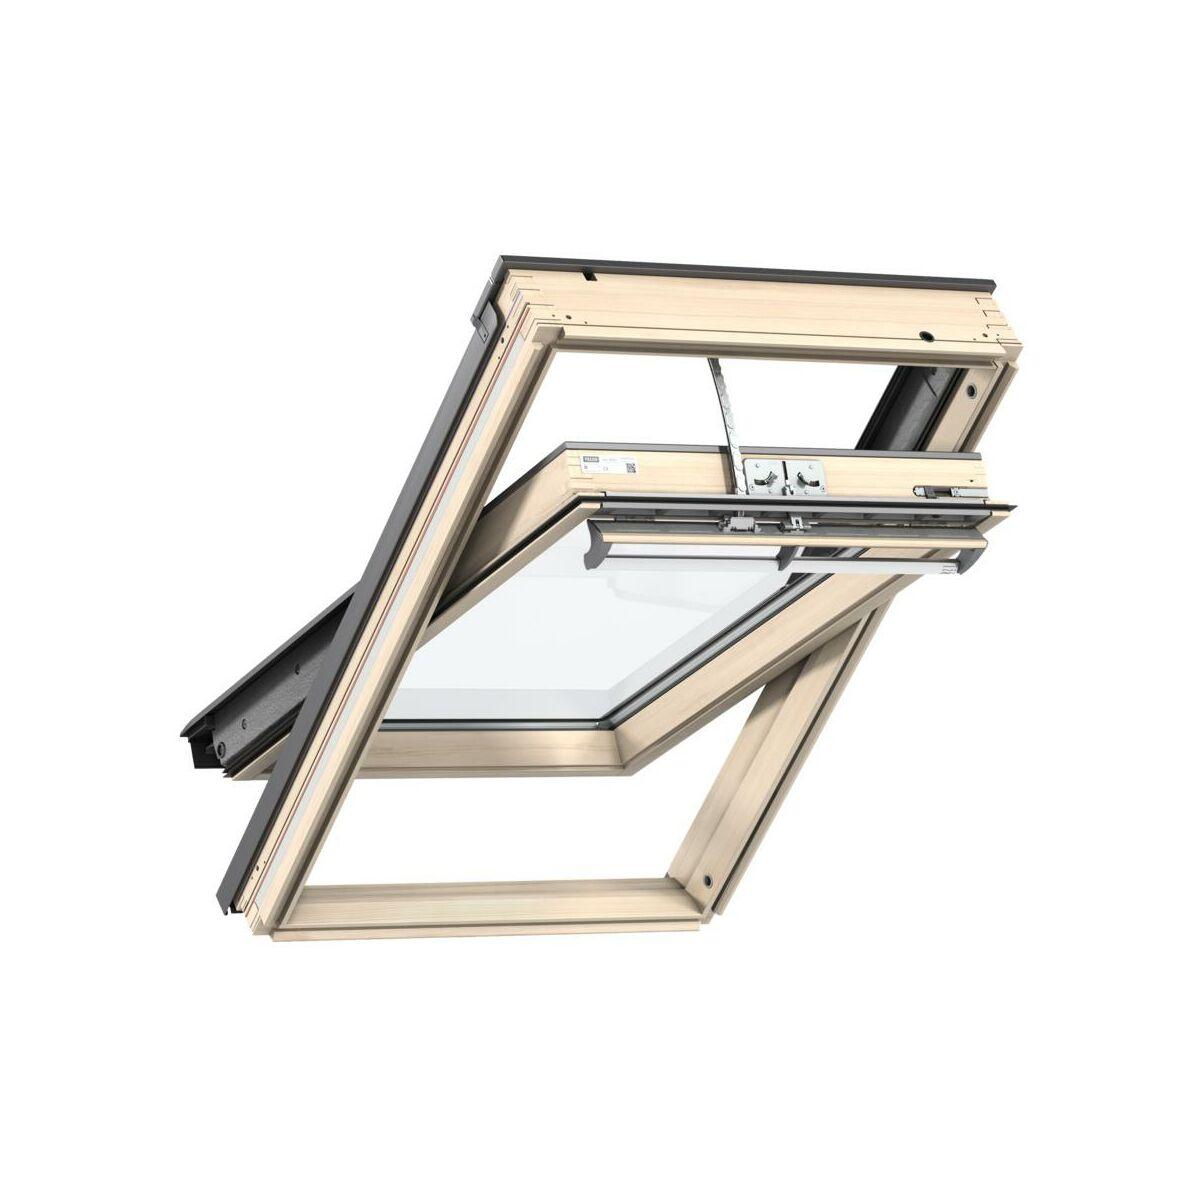 okno dachowe ggl sk06 3060r21 velux okna dachowe w. Black Bedroom Furniture Sets. Home Design Ideas